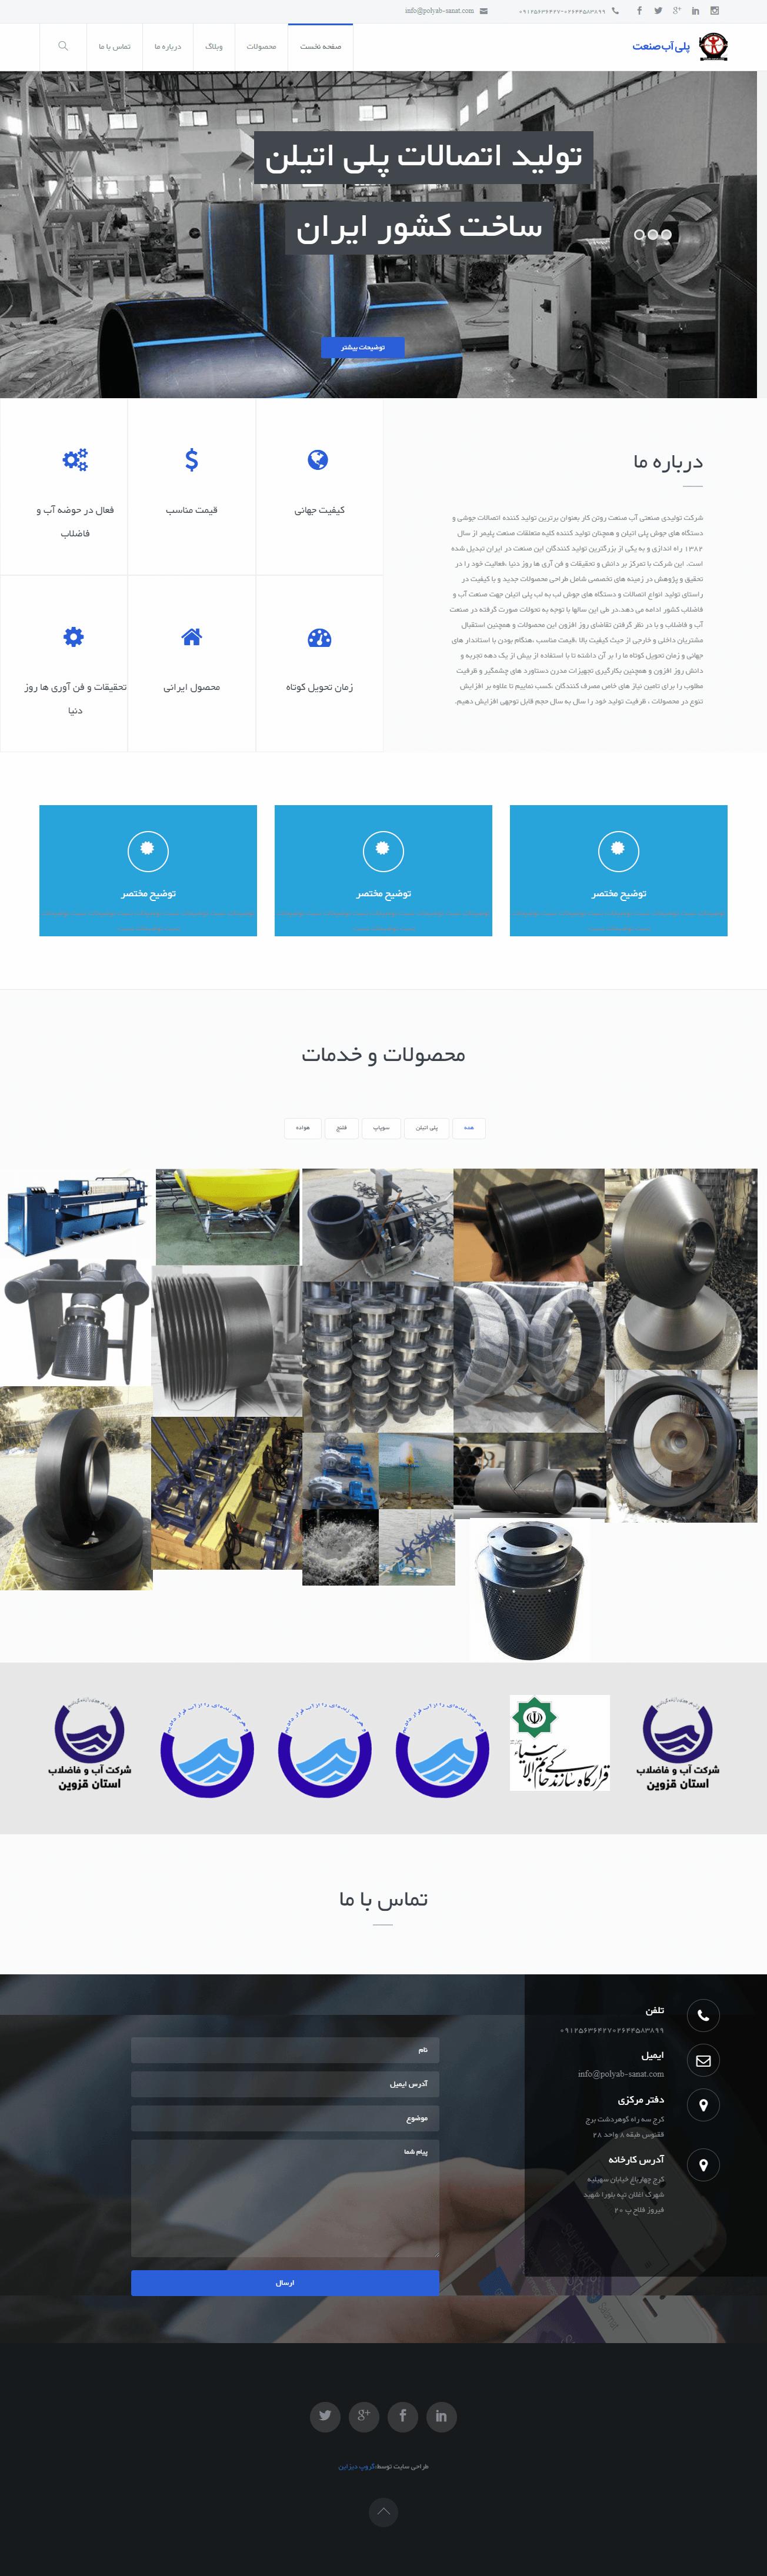 طراحی سایت شرکت پلی آب صنعت